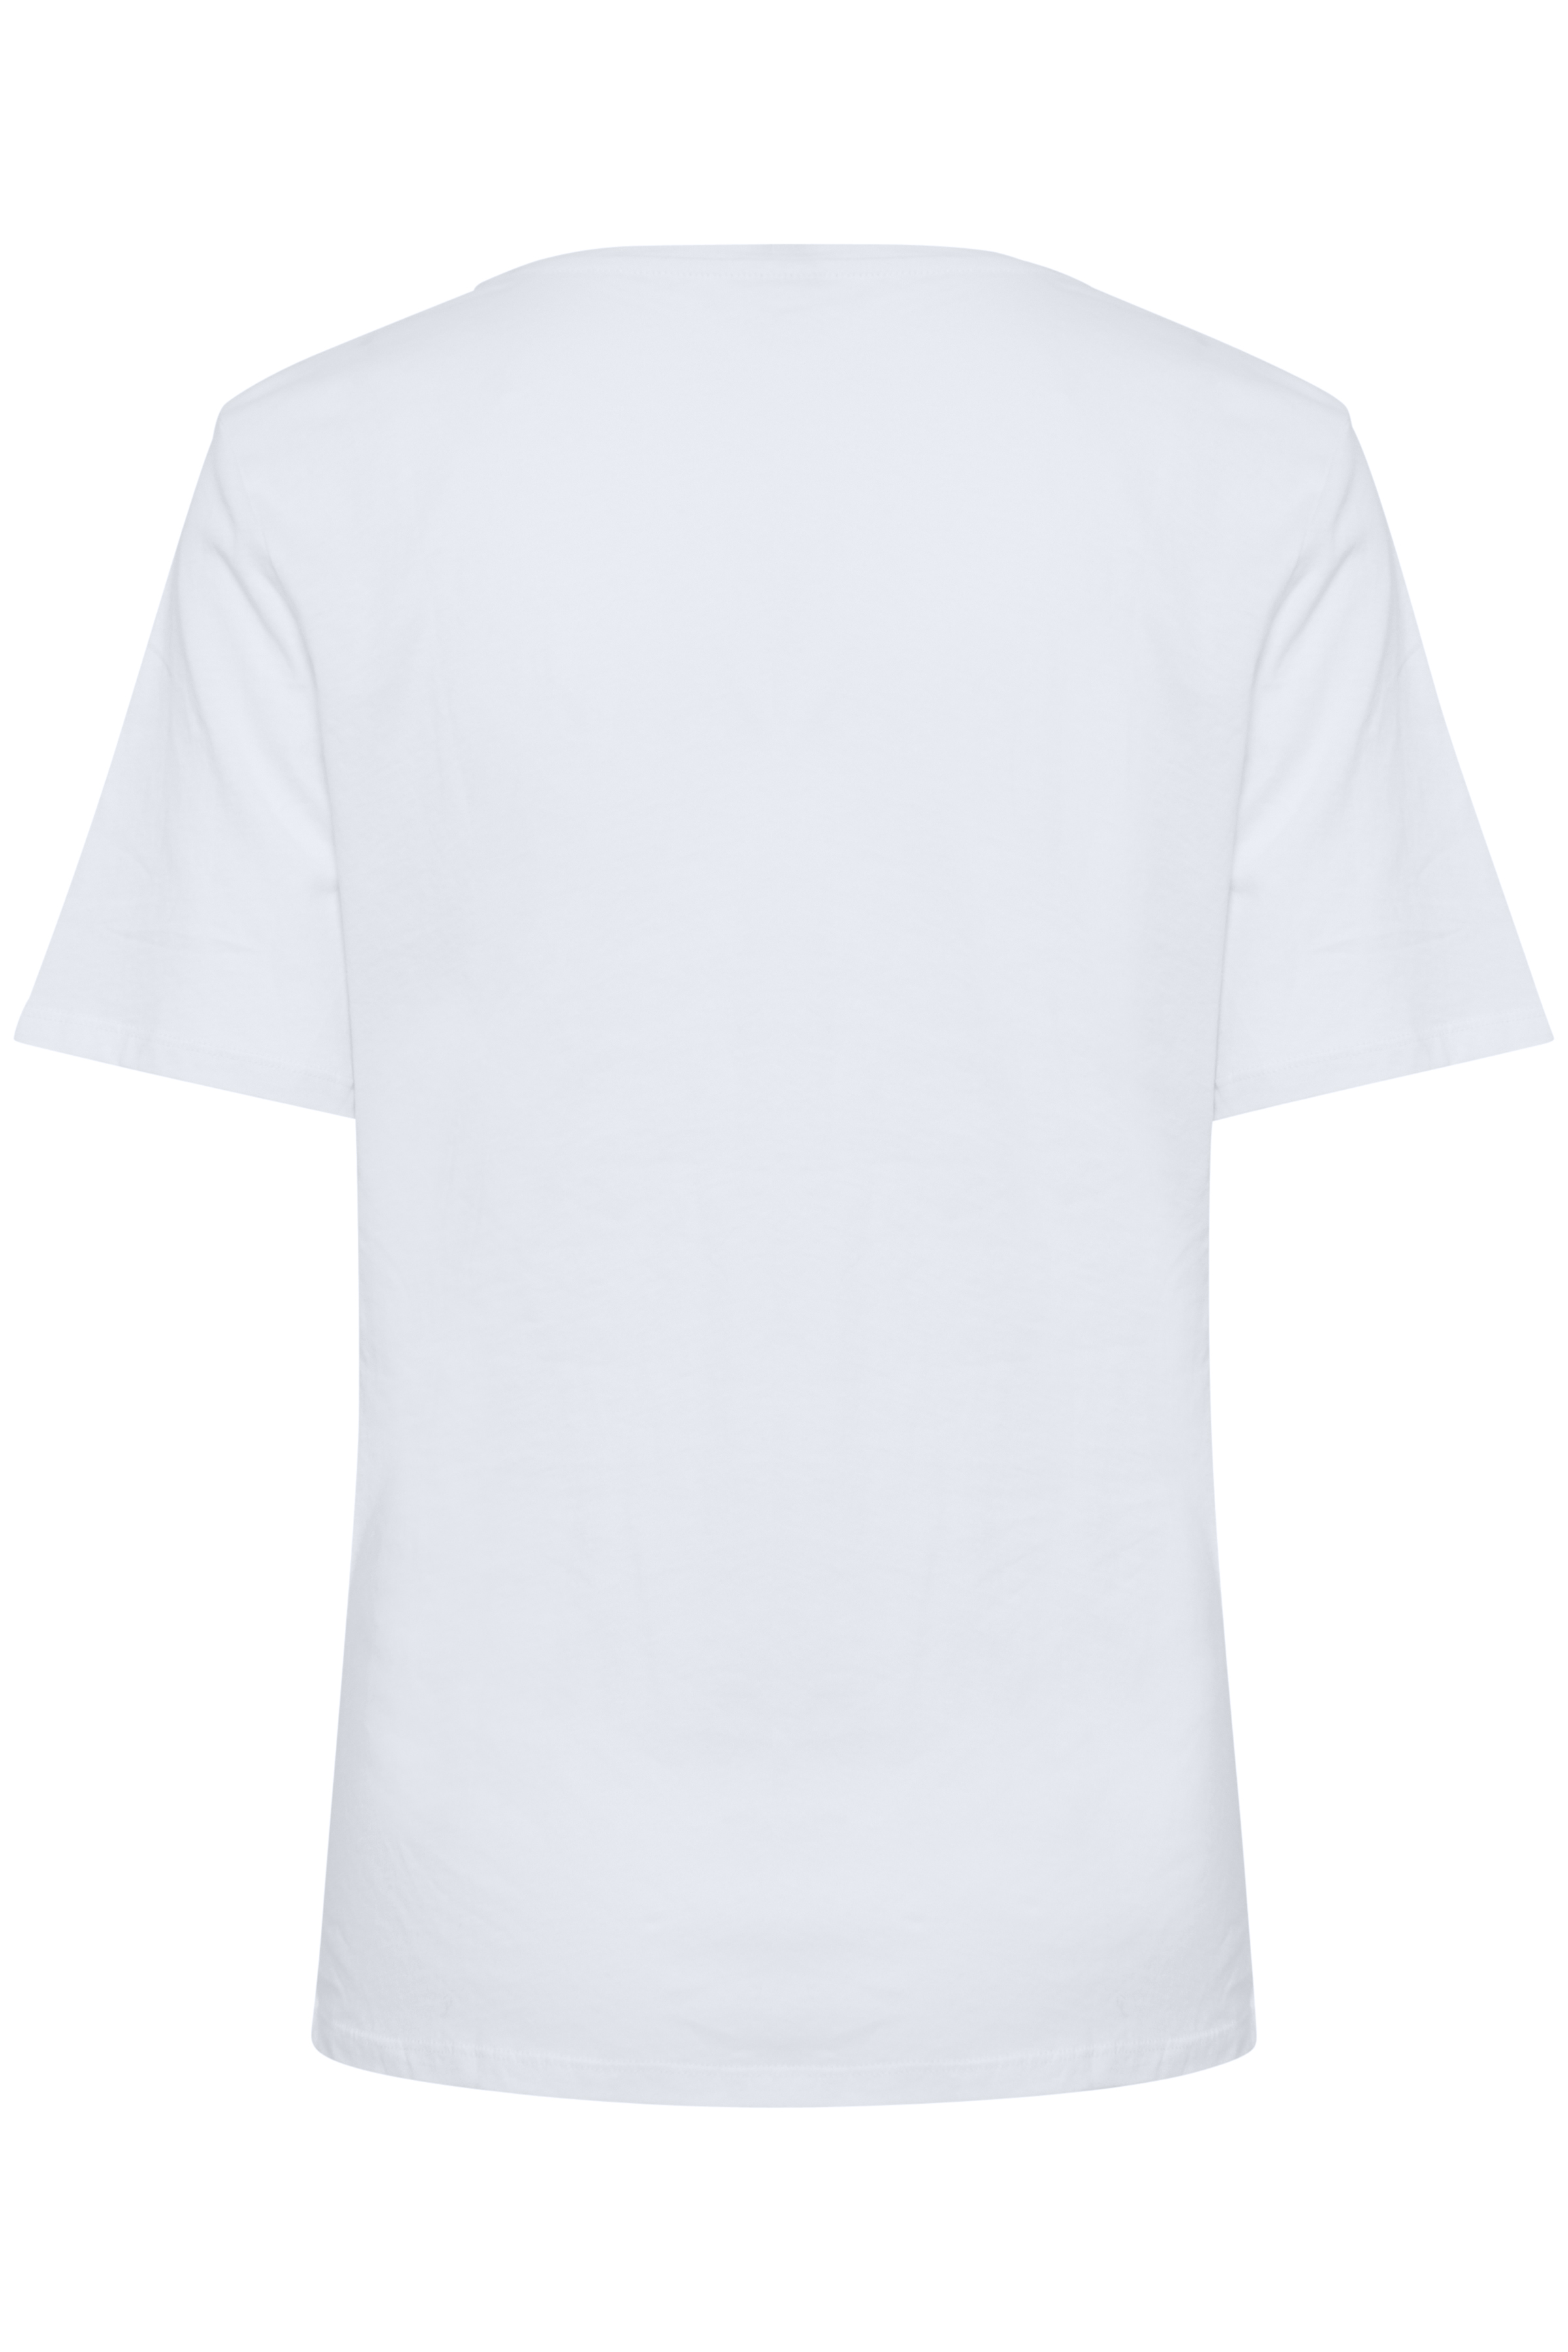 Optical White T-Shirt – Køb Optical White T-Shirt fra str. XS-XXL her